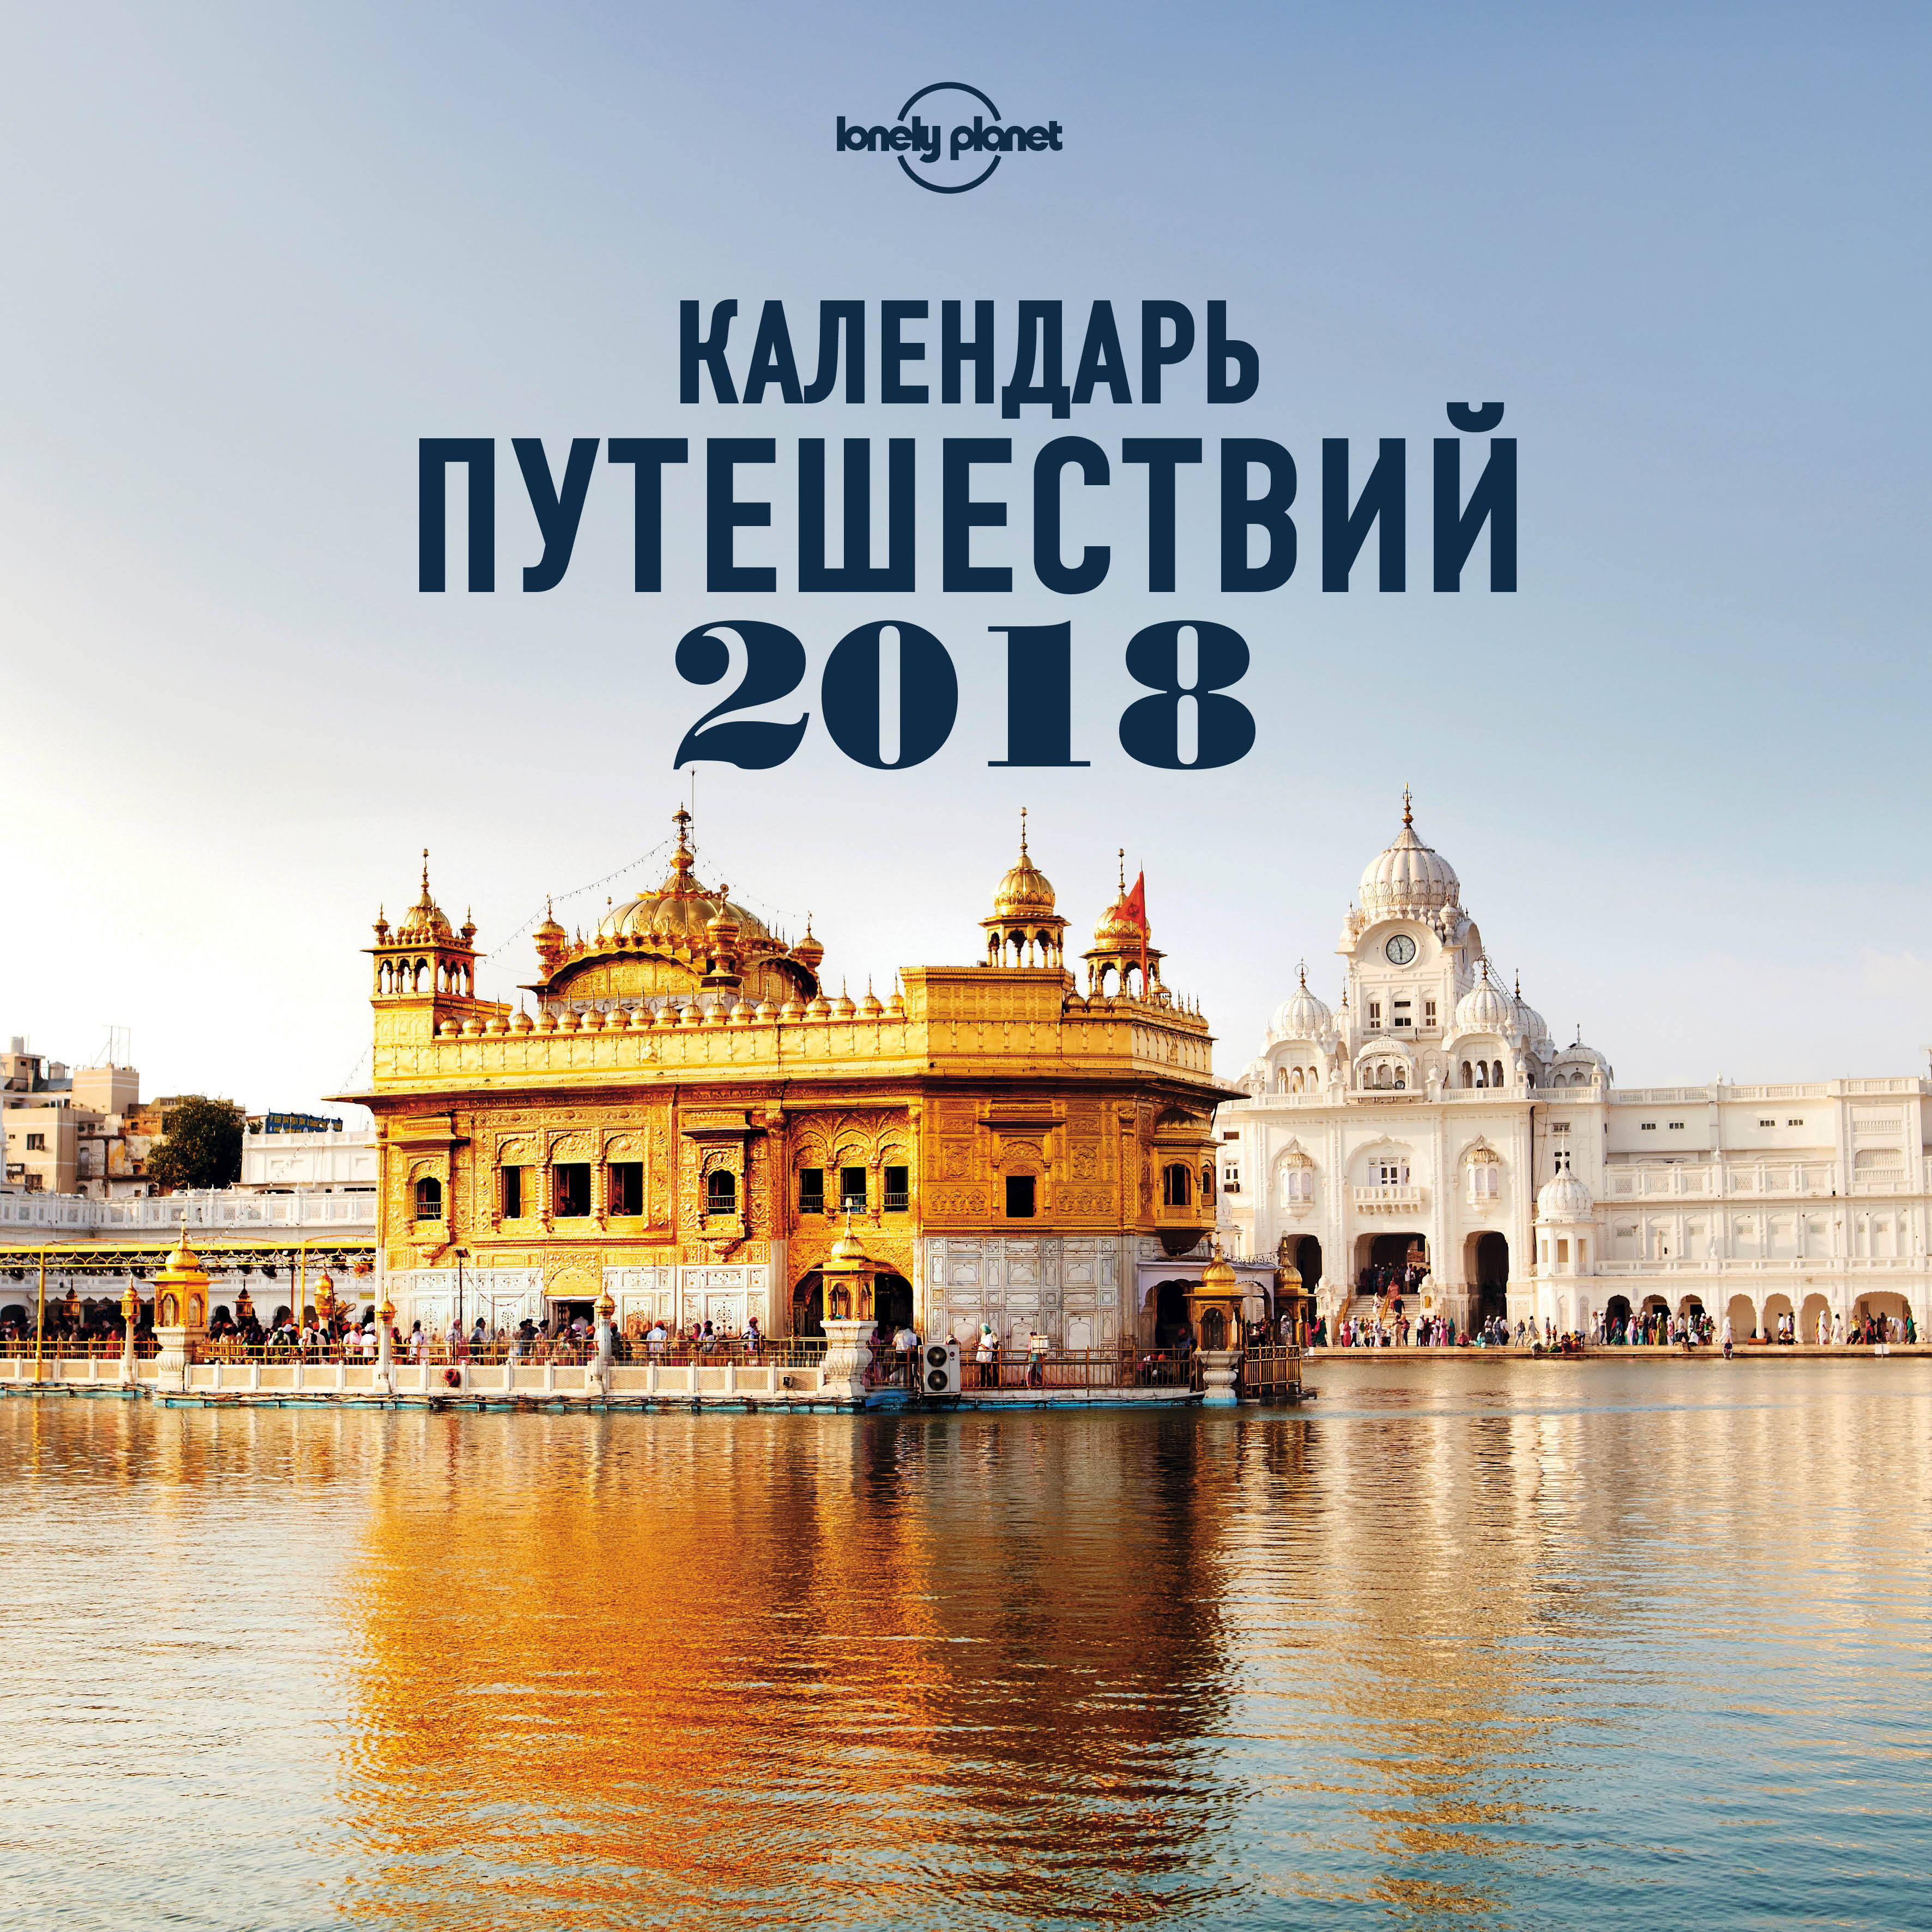 Календарь путешествий 2018 (Lonely Planet) календарь времена и лета на 2018 год